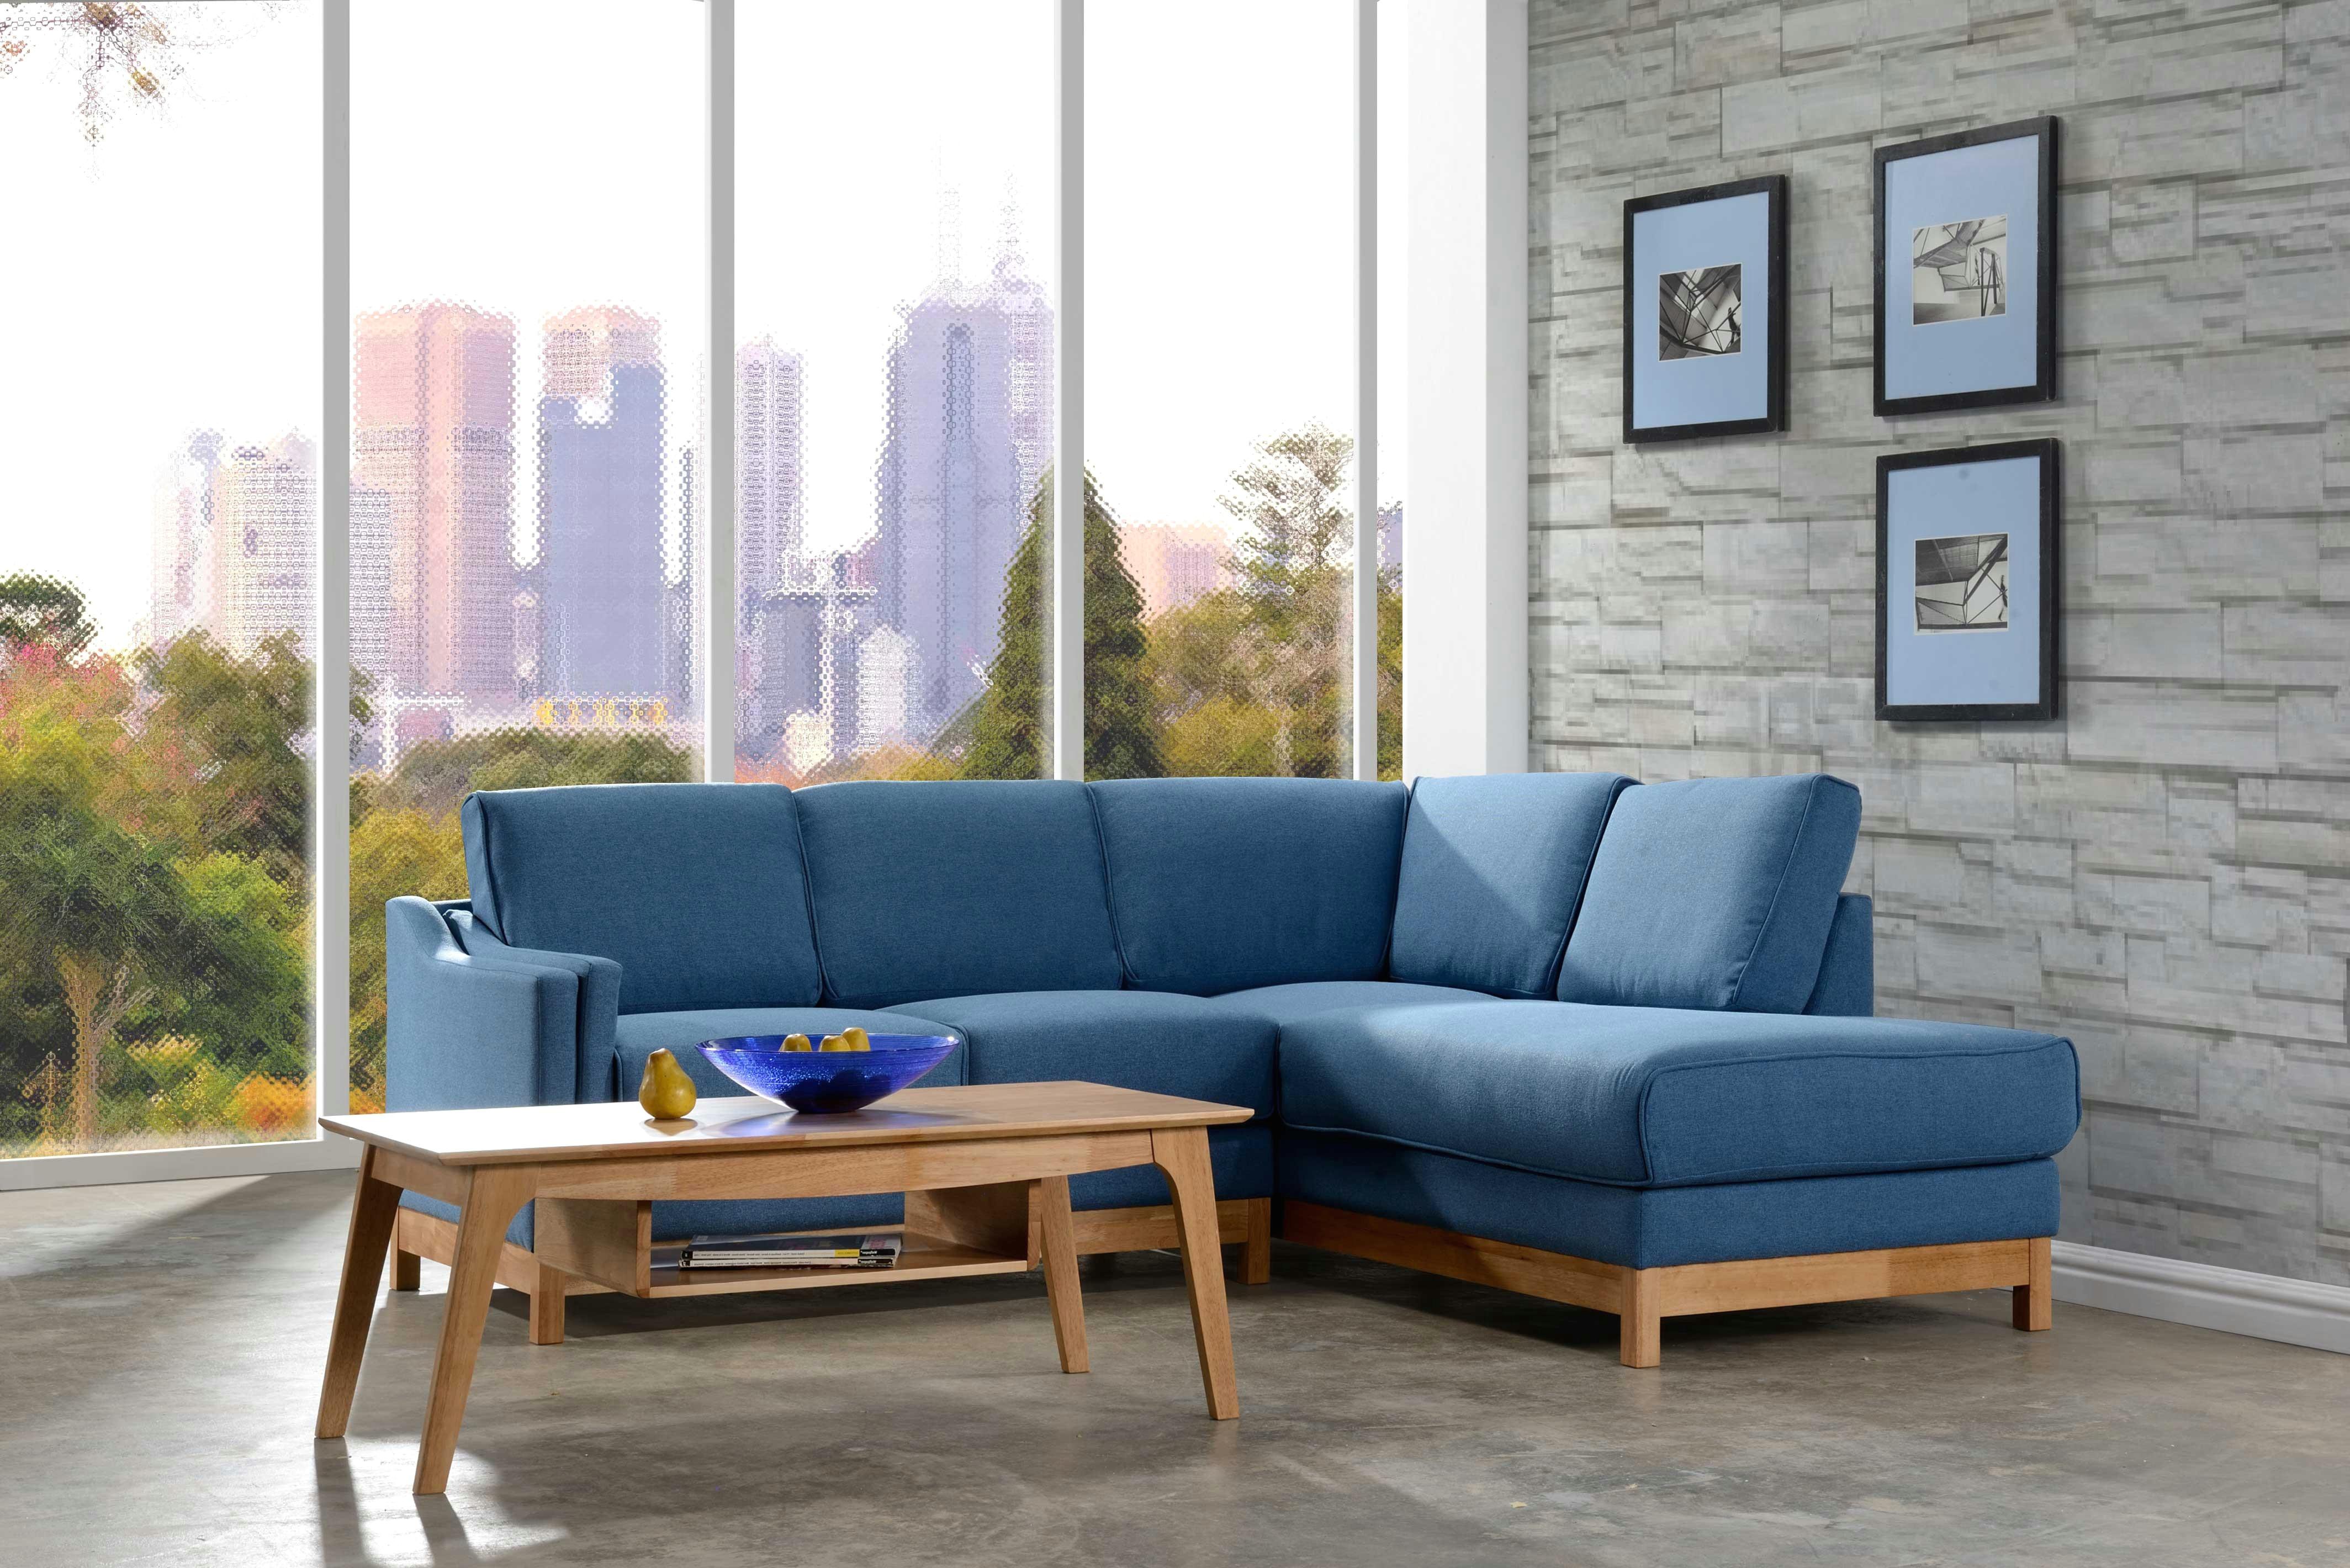 enchanting best of living room l shaped sofa designs in 16 fortable l shape sofa set